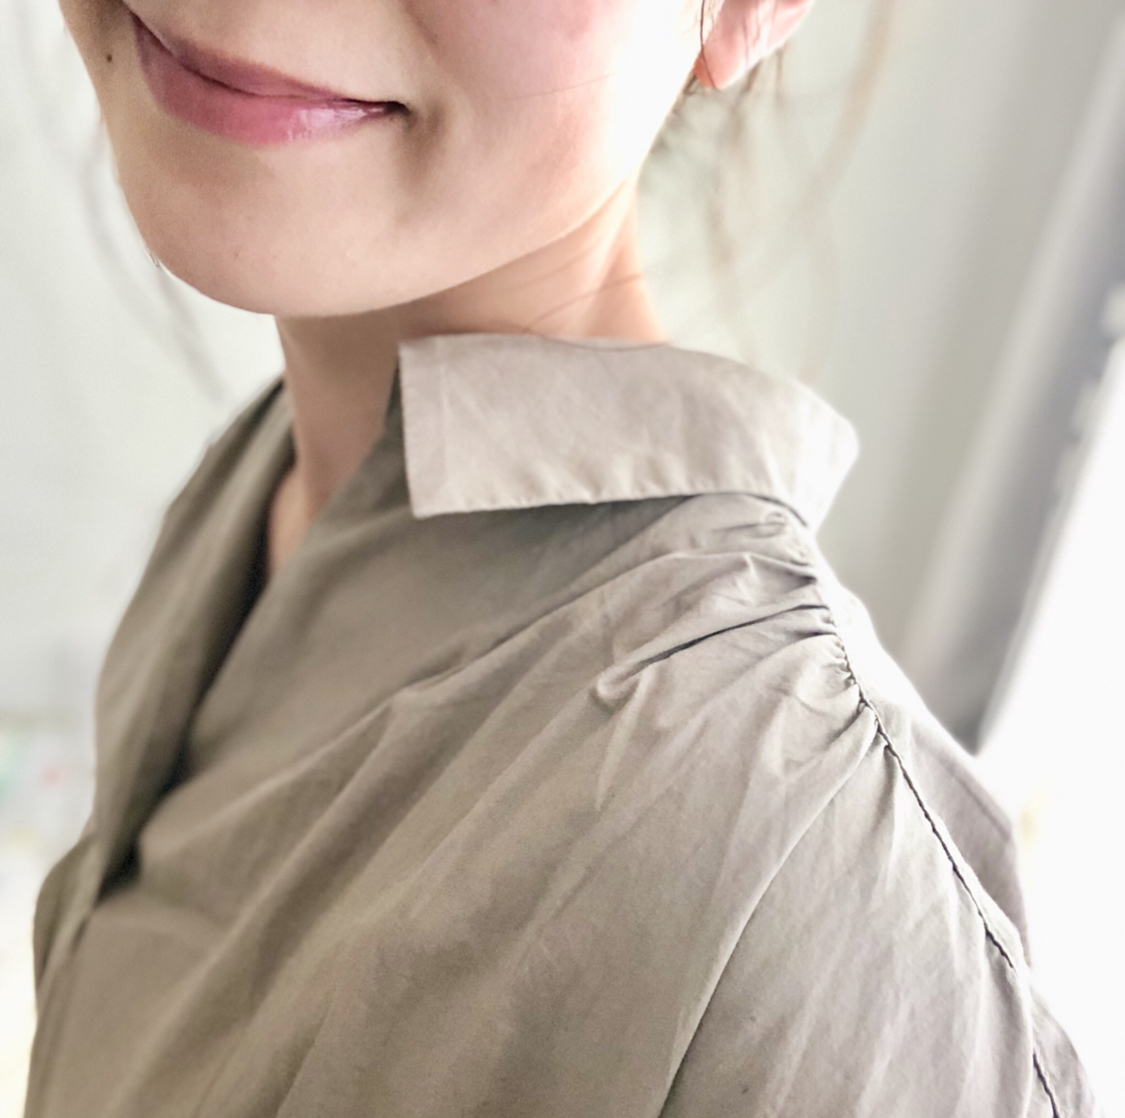 【GU新作】SNSで話題沸騰の《Aラインシャツワンピース》は週4着られる優秀アイテム❤️_2